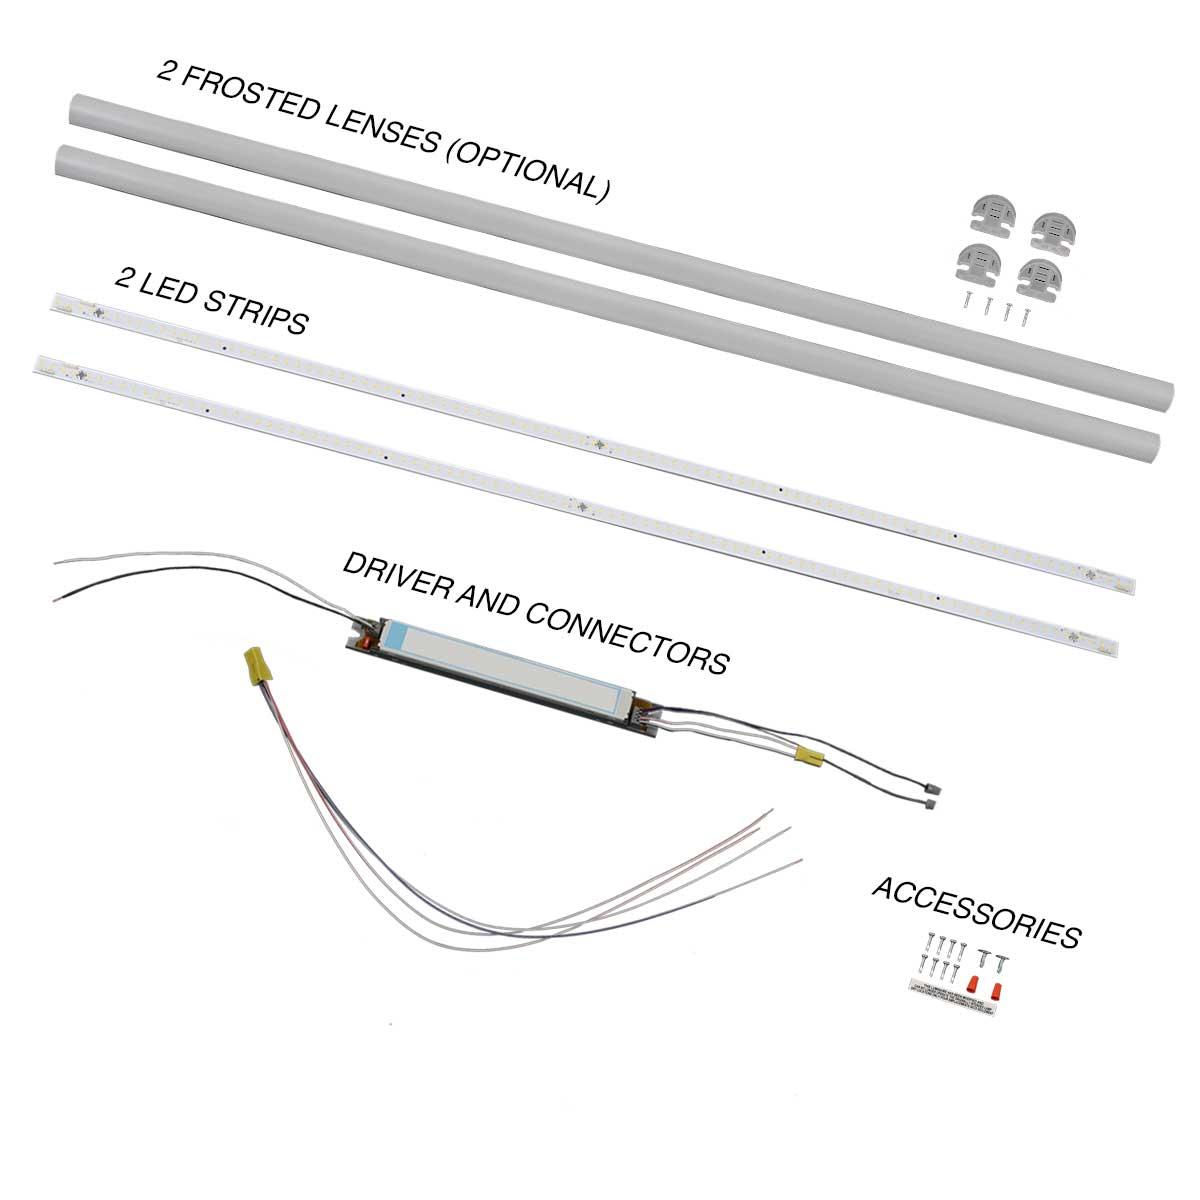 GEN 3 LED retrofit kit for 2x4 fluorescent lights